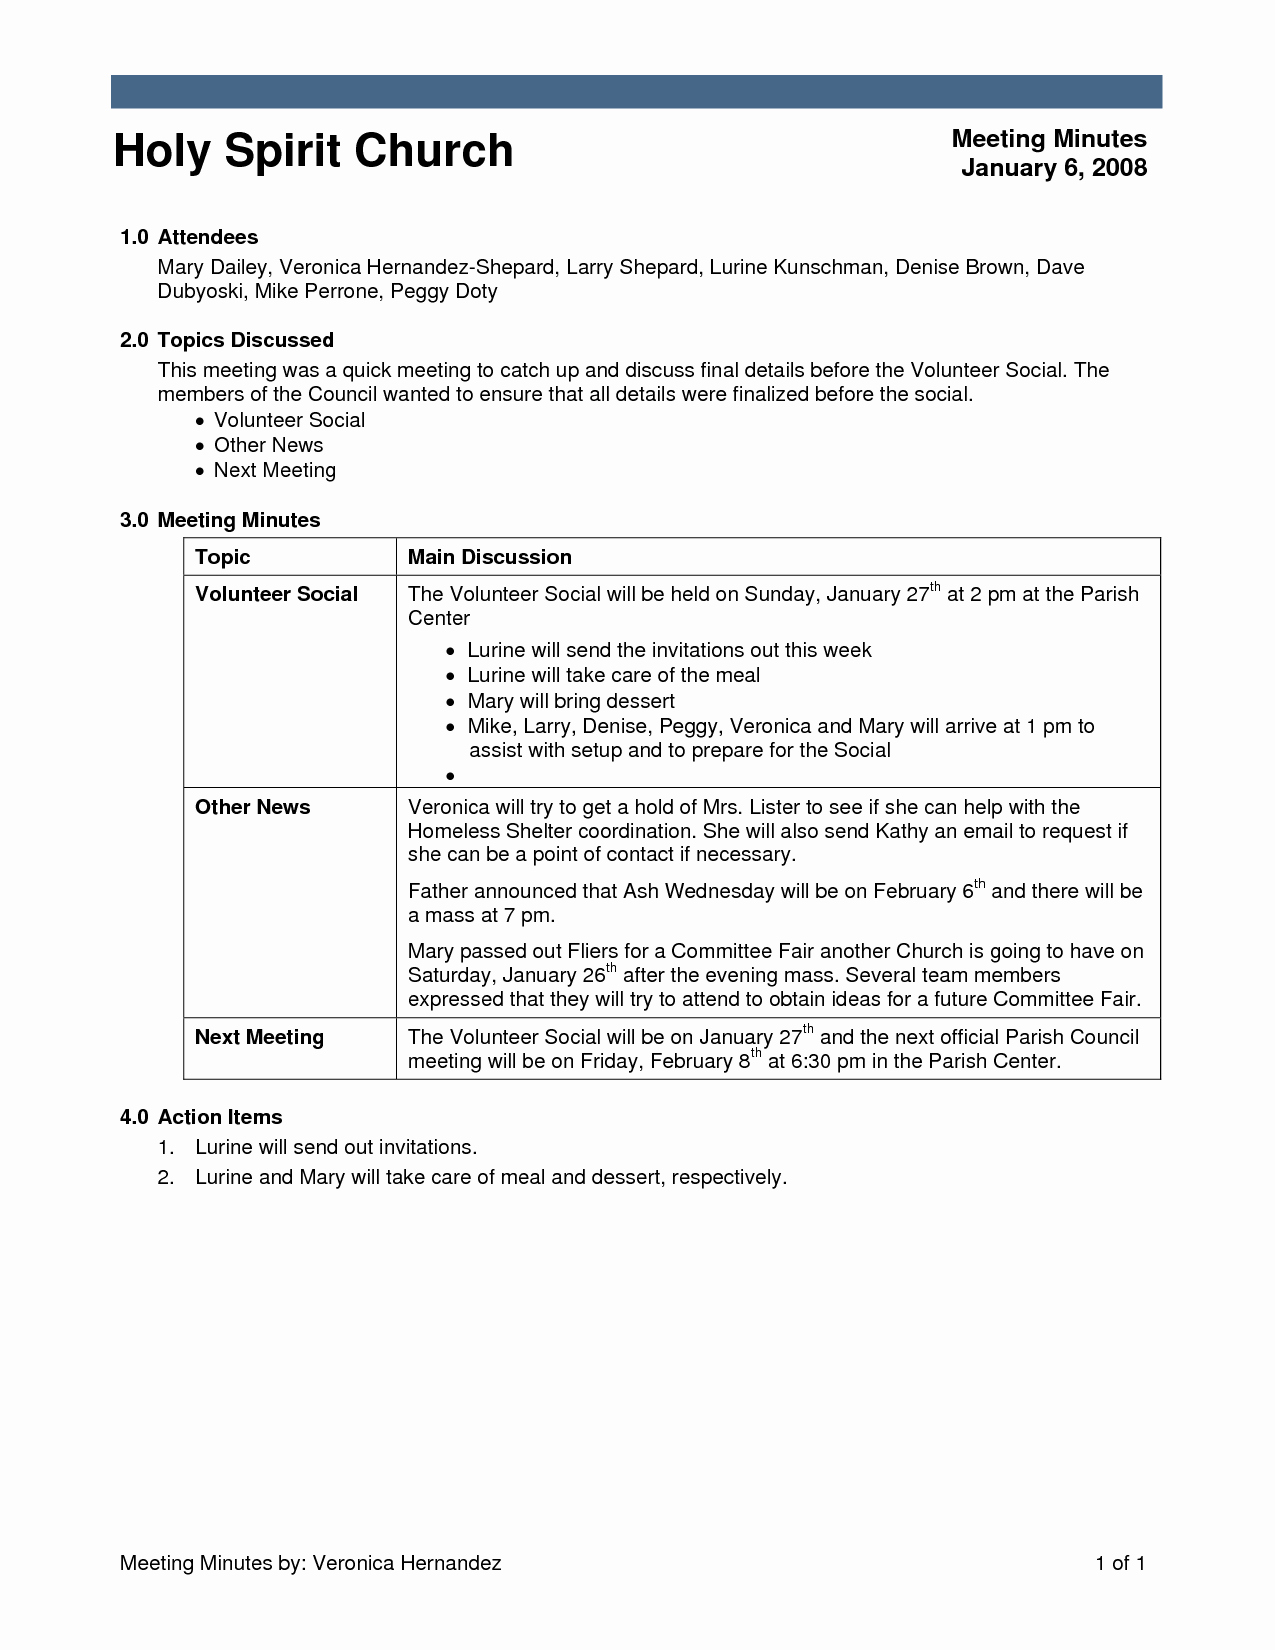 Church Meeting Minutes Template Unique Best S Of Sample Church Meeting Minutes Template